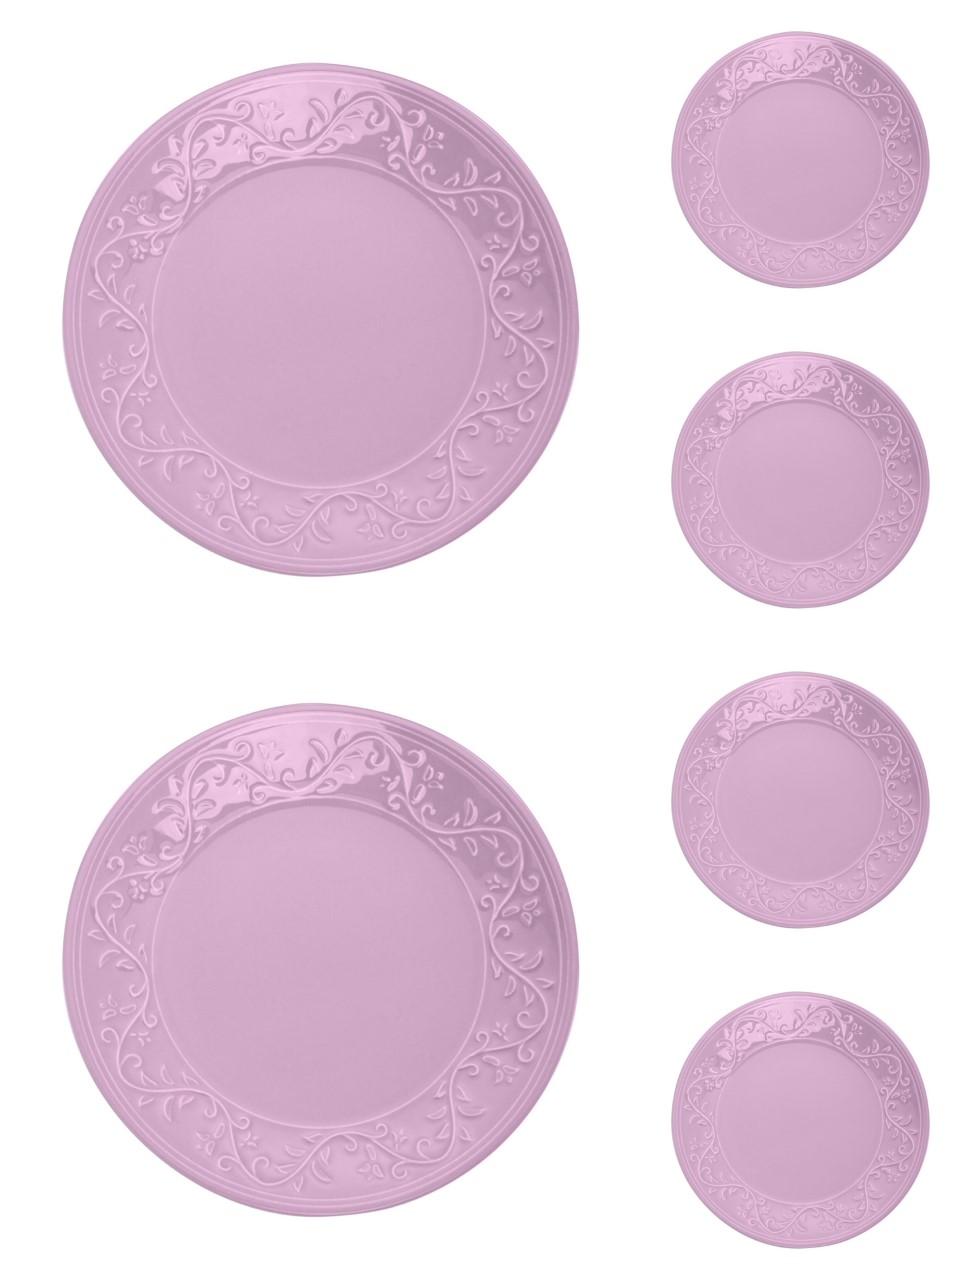 Jogo 6 pratos 20 cm para sobremesa de cerâmica Alanya Plum Wolff - 17498